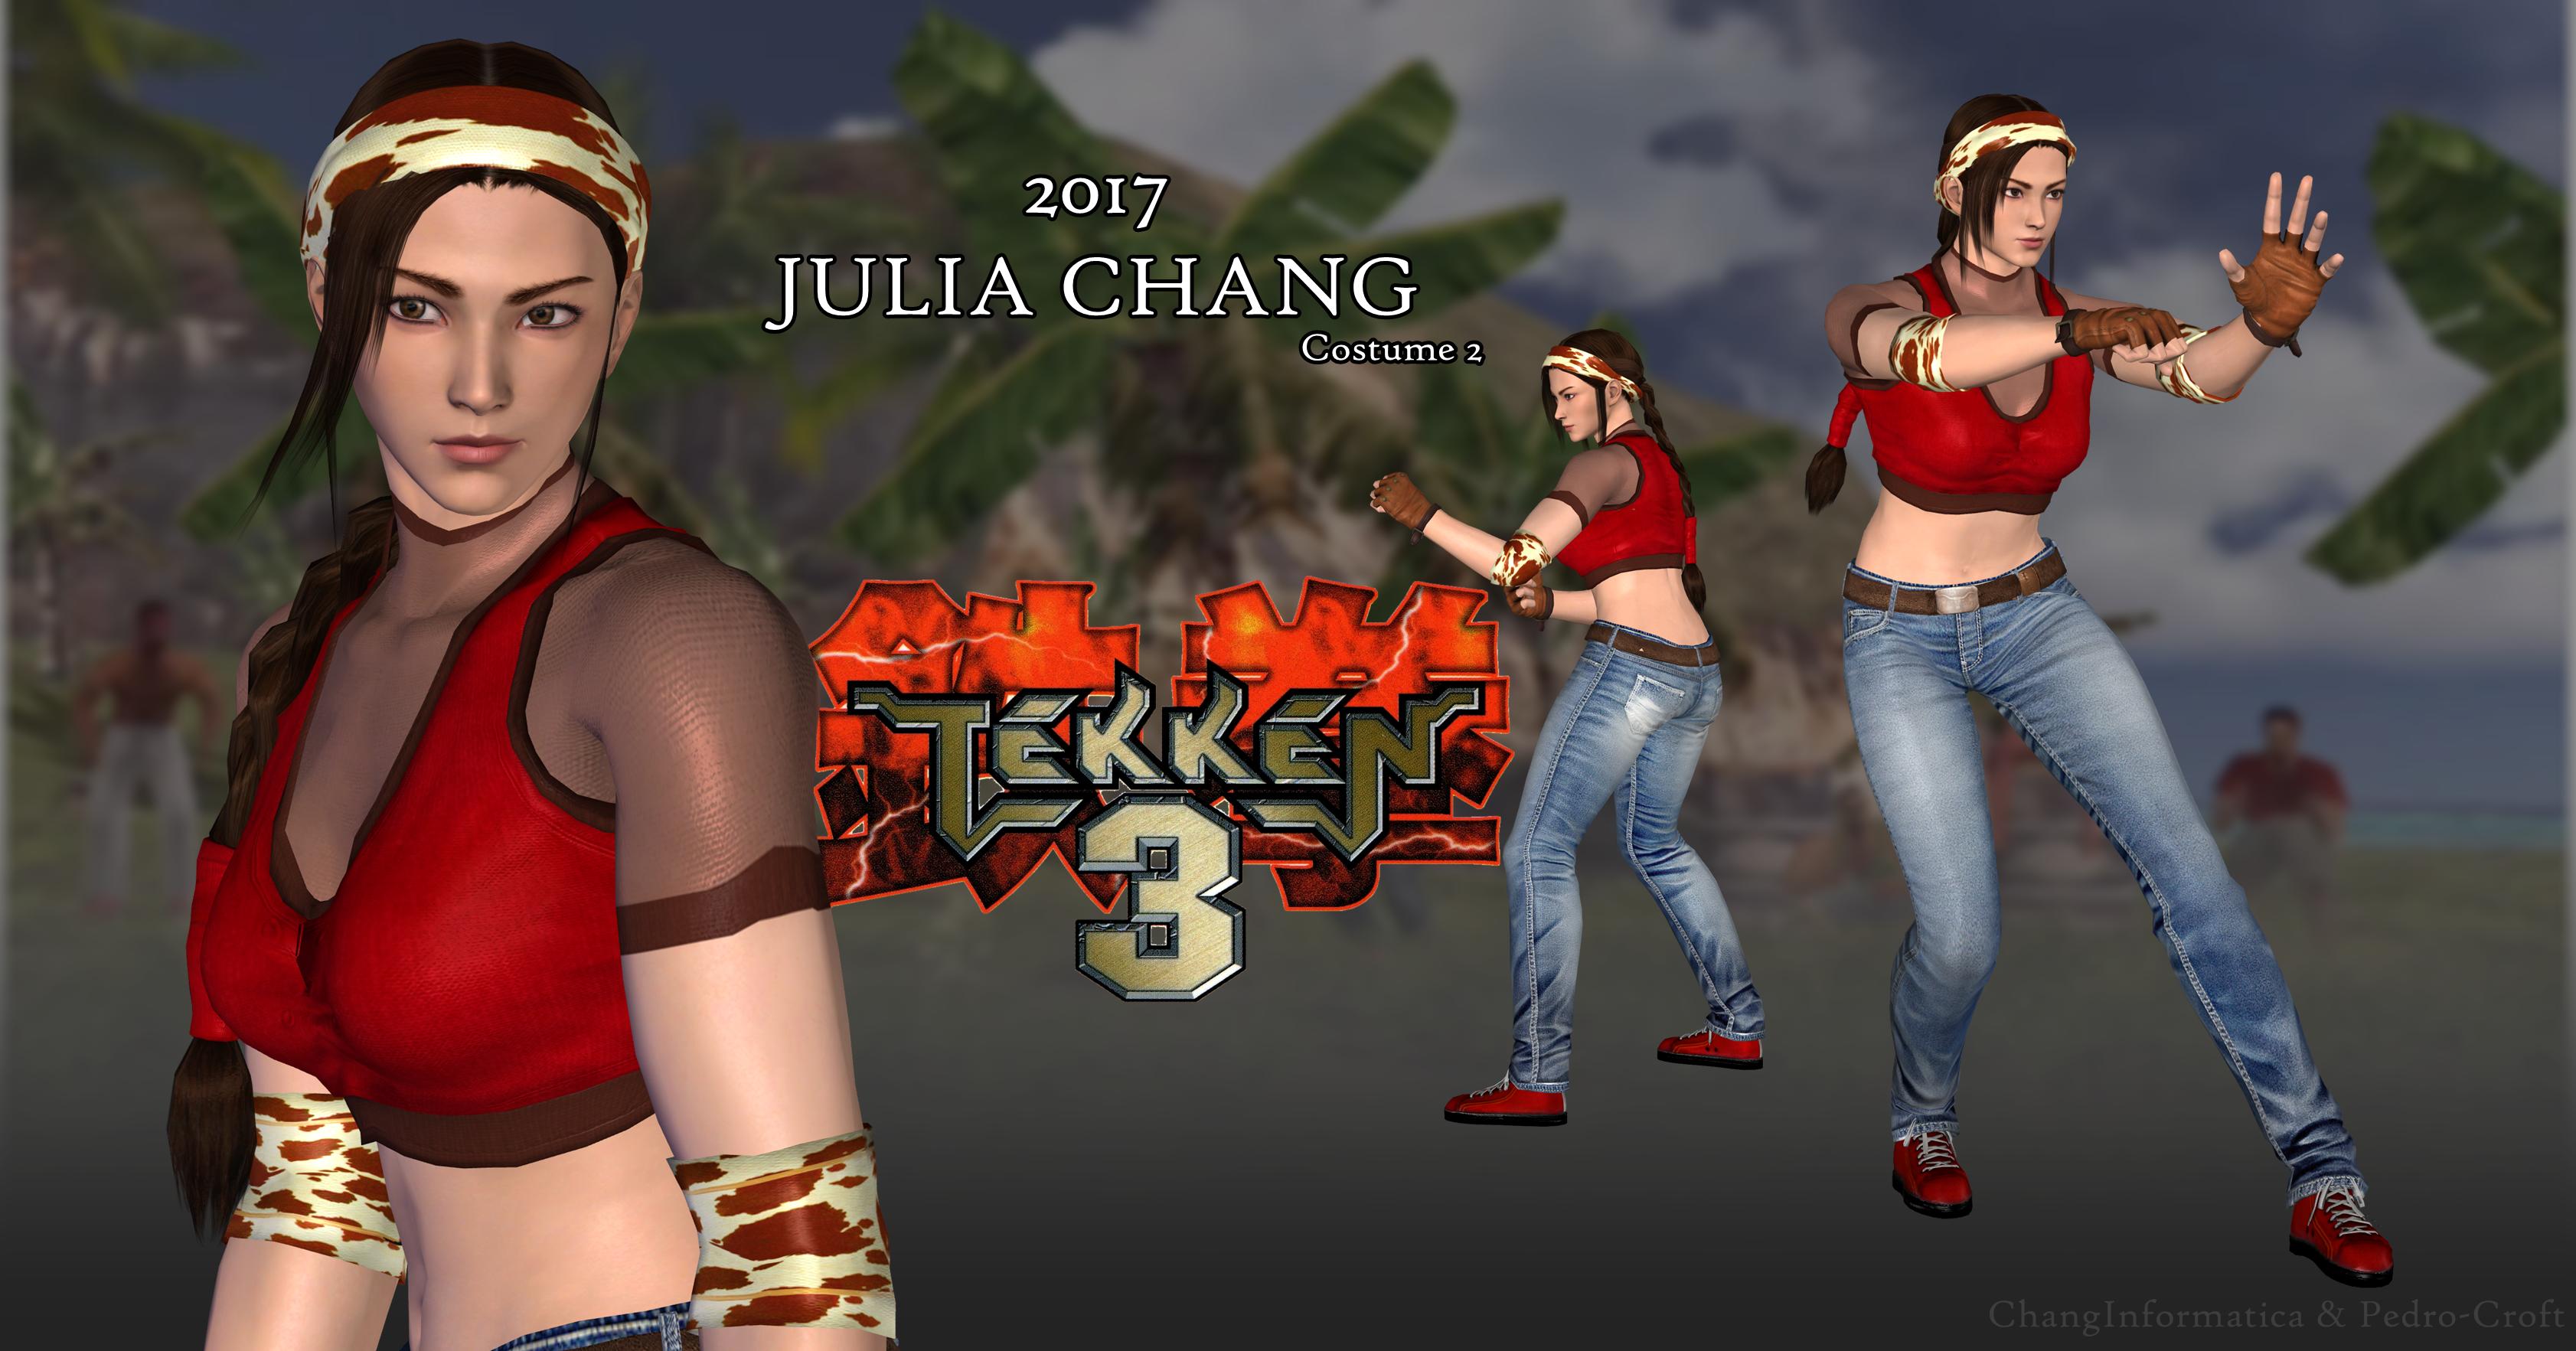 jin kazama and julia chang relationship